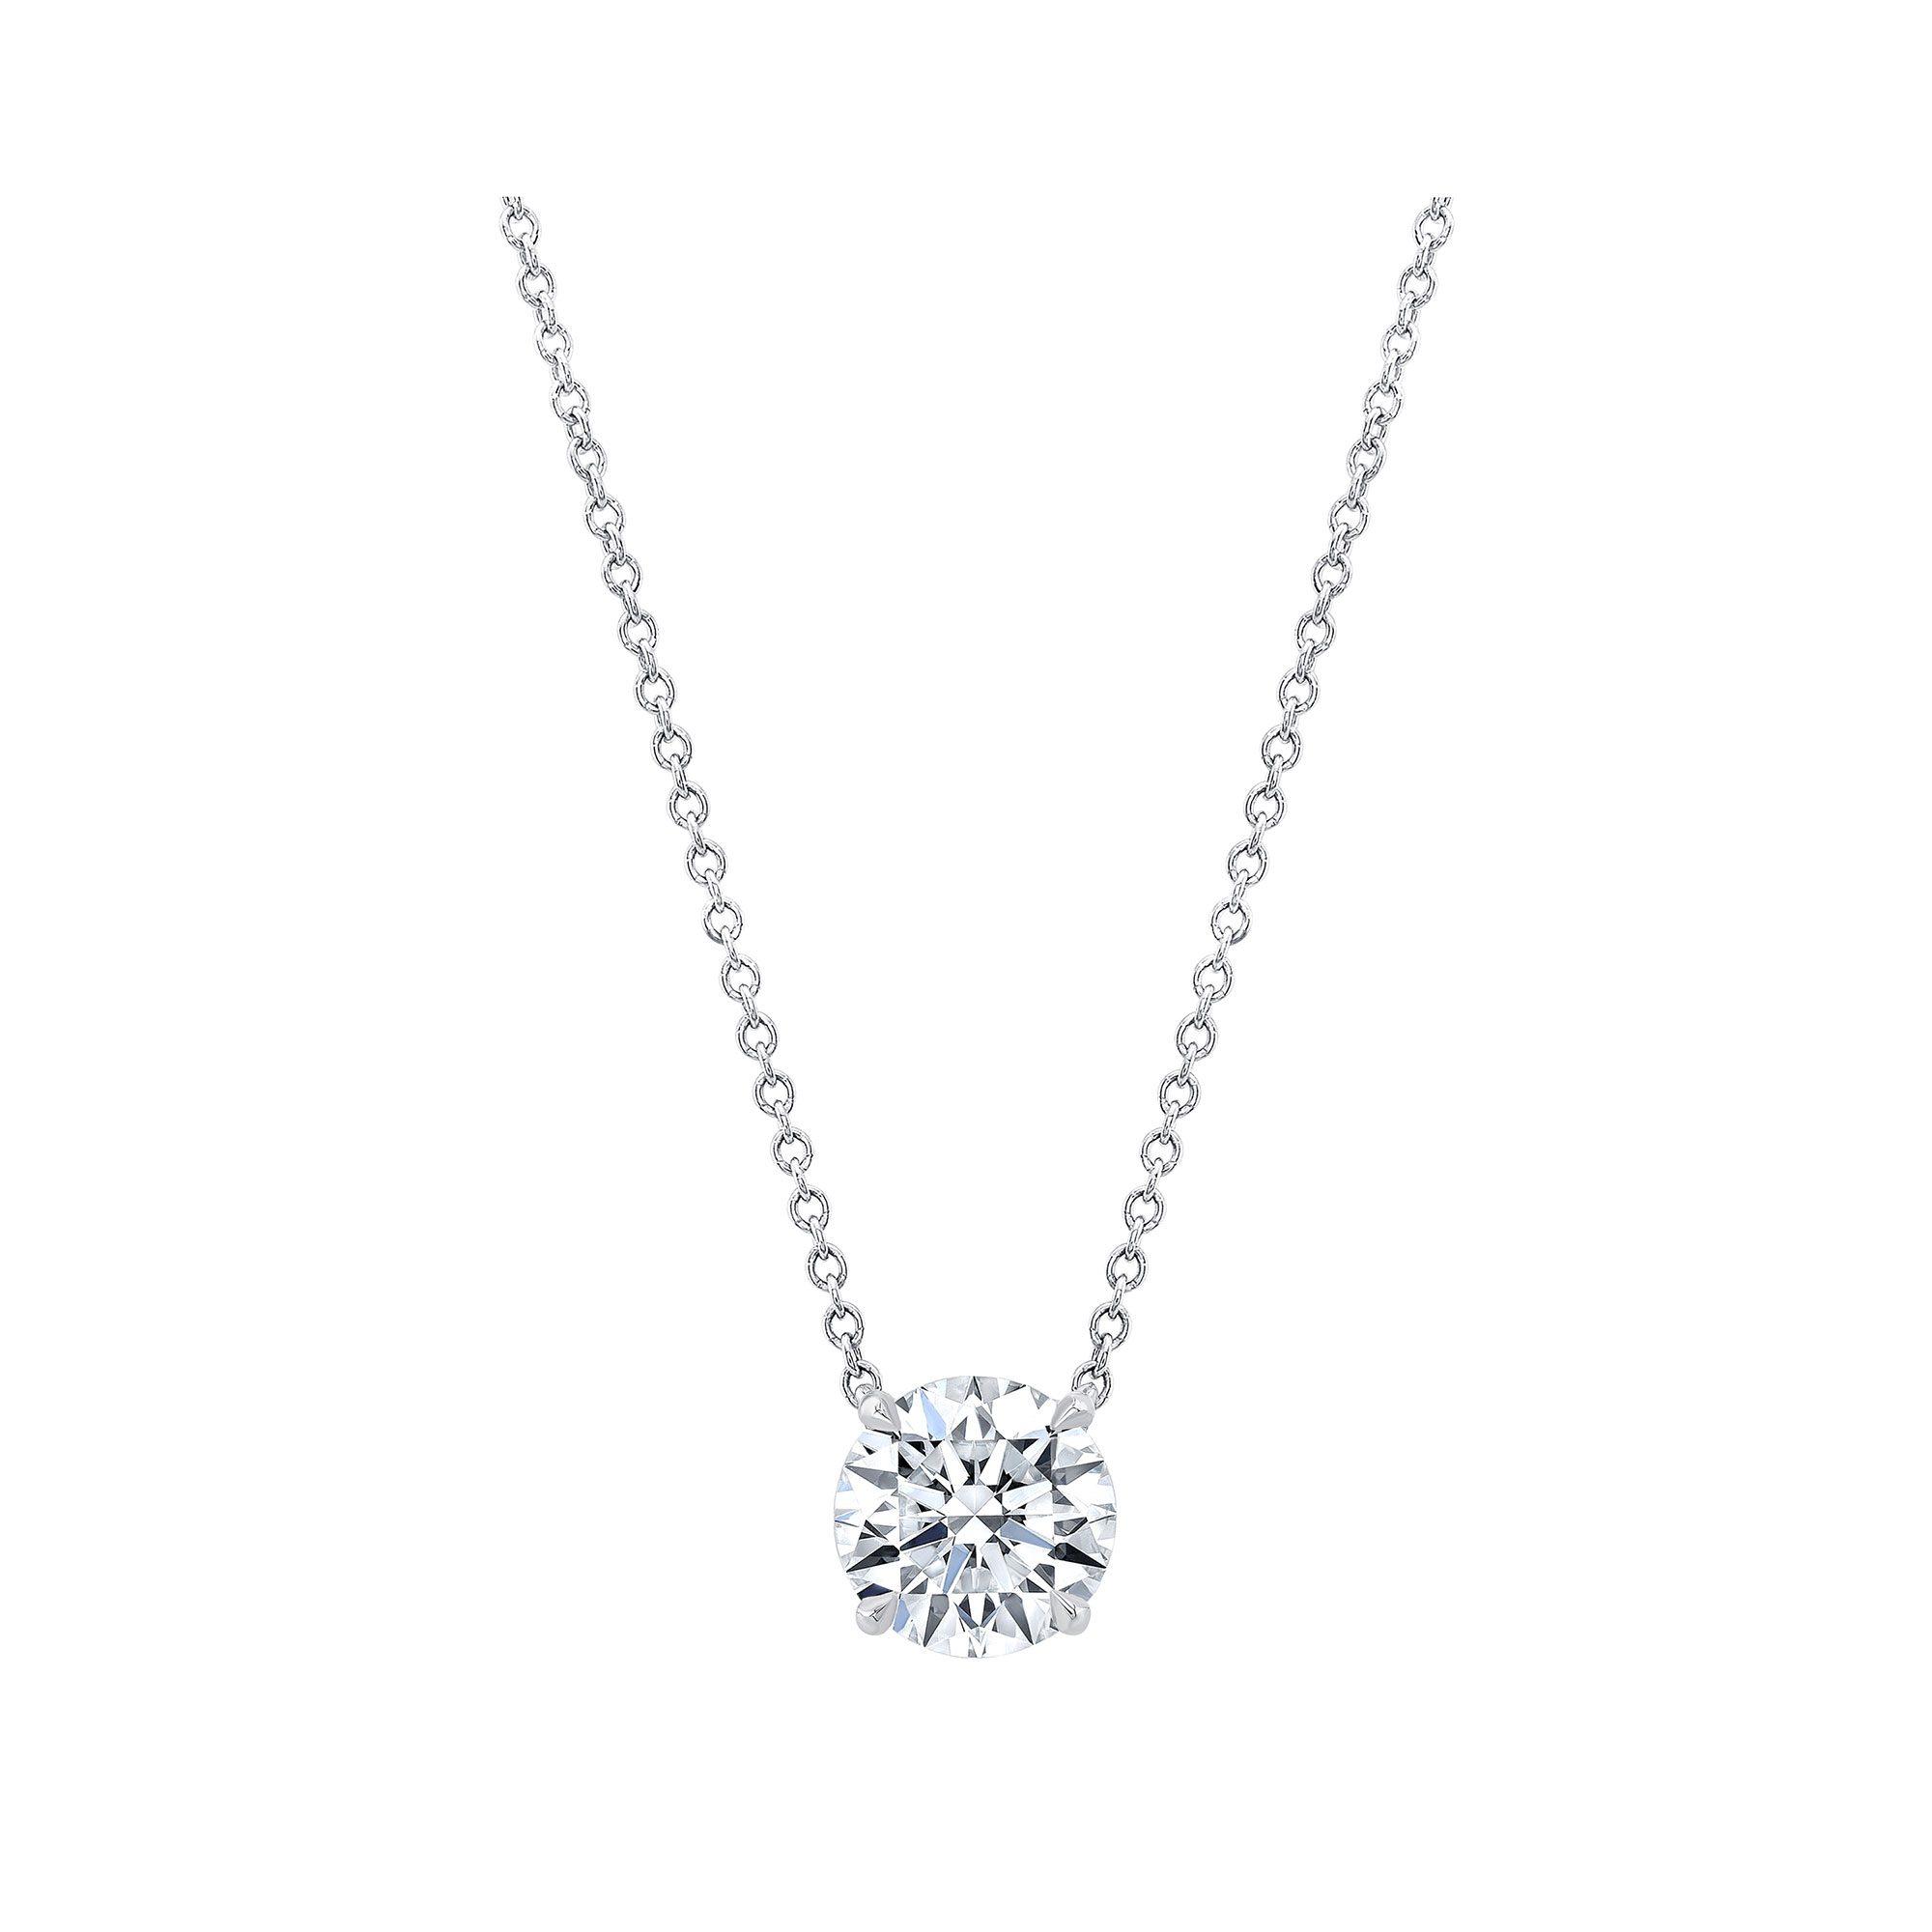 Marie Round Brilliant 2 Carat Lab Grown Diamond Necklace Pendant in White Gold